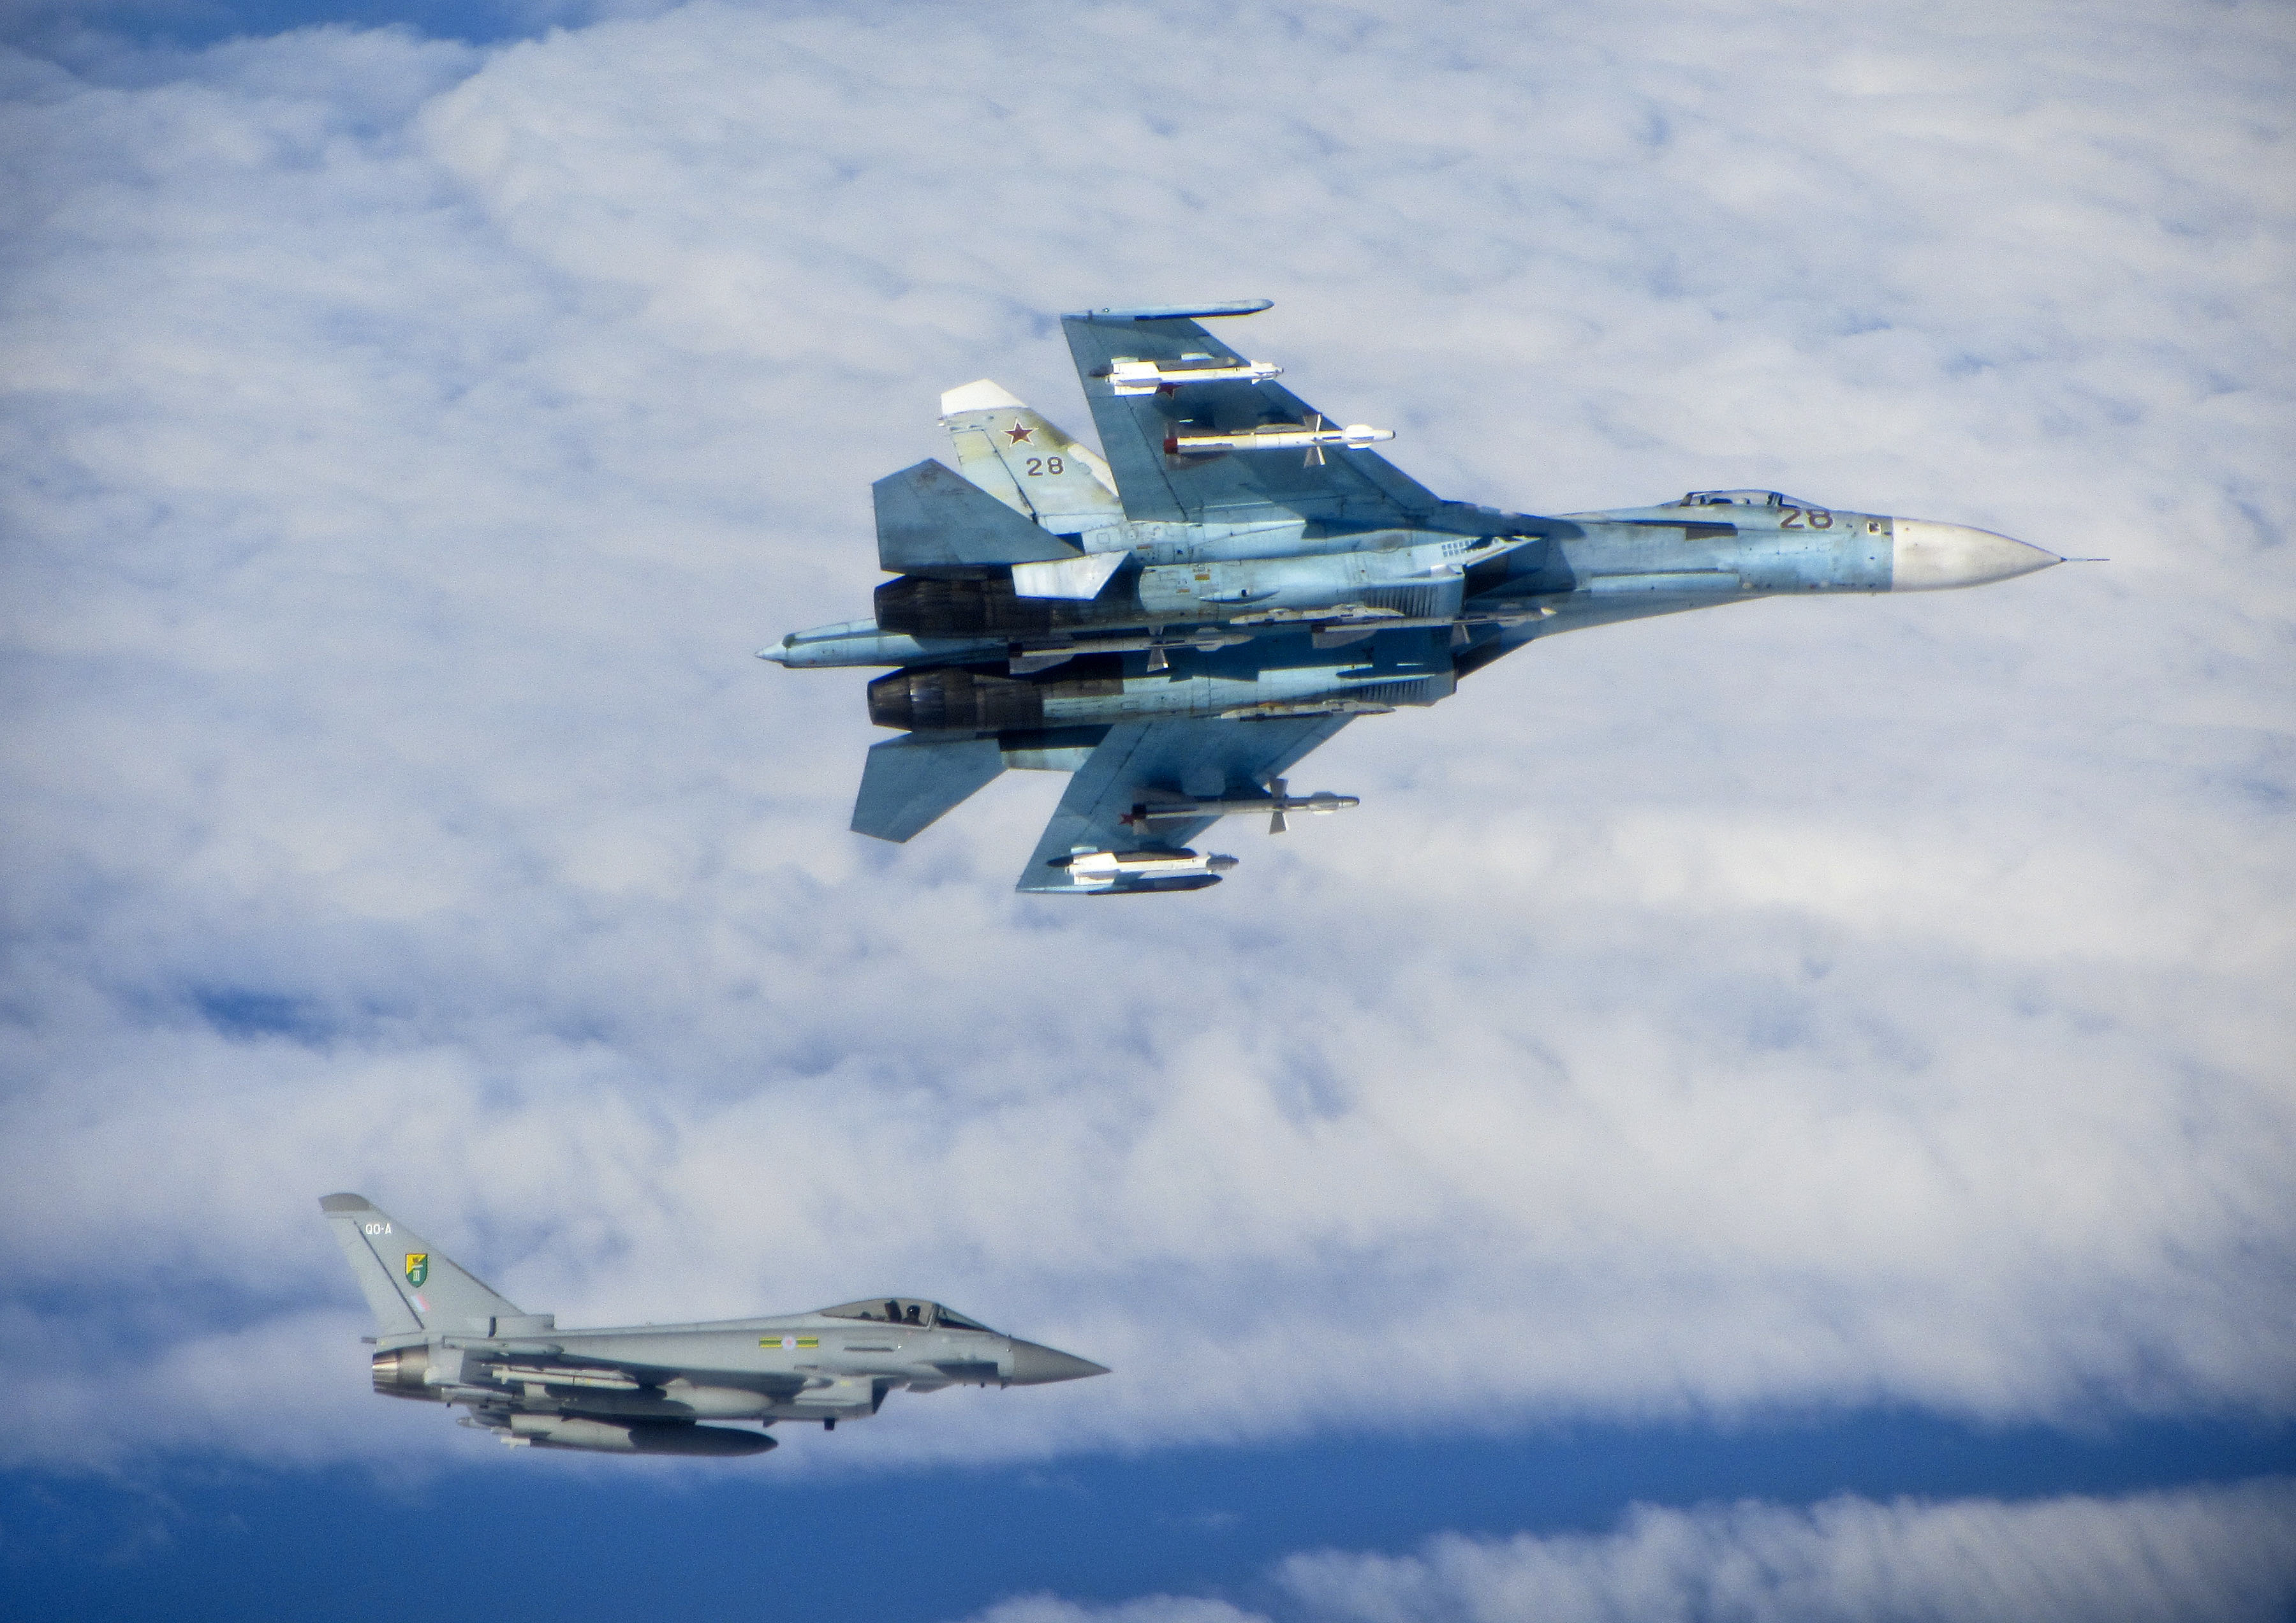 Russian_SU-27_Flanker_with_RAF_Typhoon_M